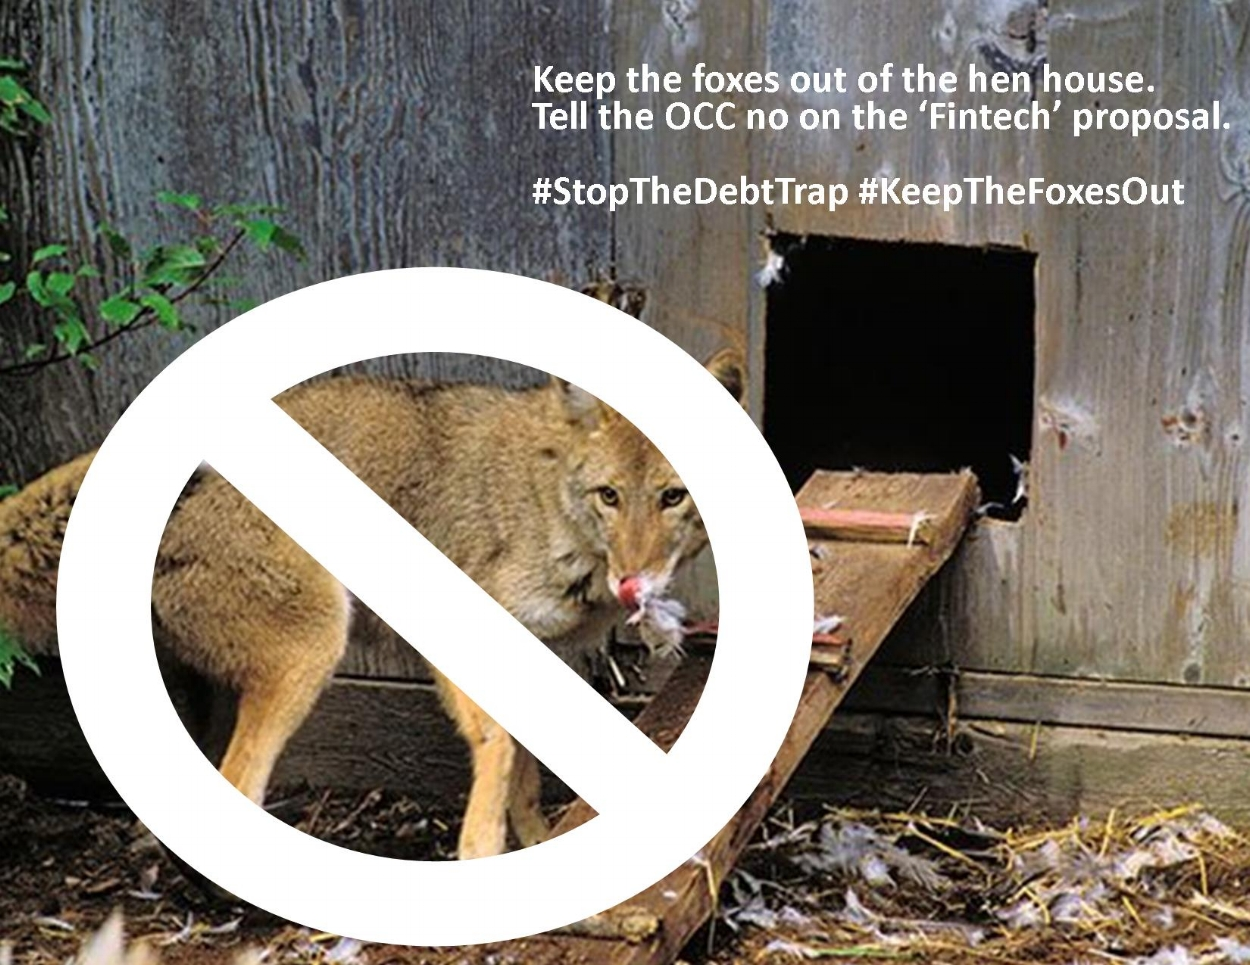 #KeepTheFoxesOut